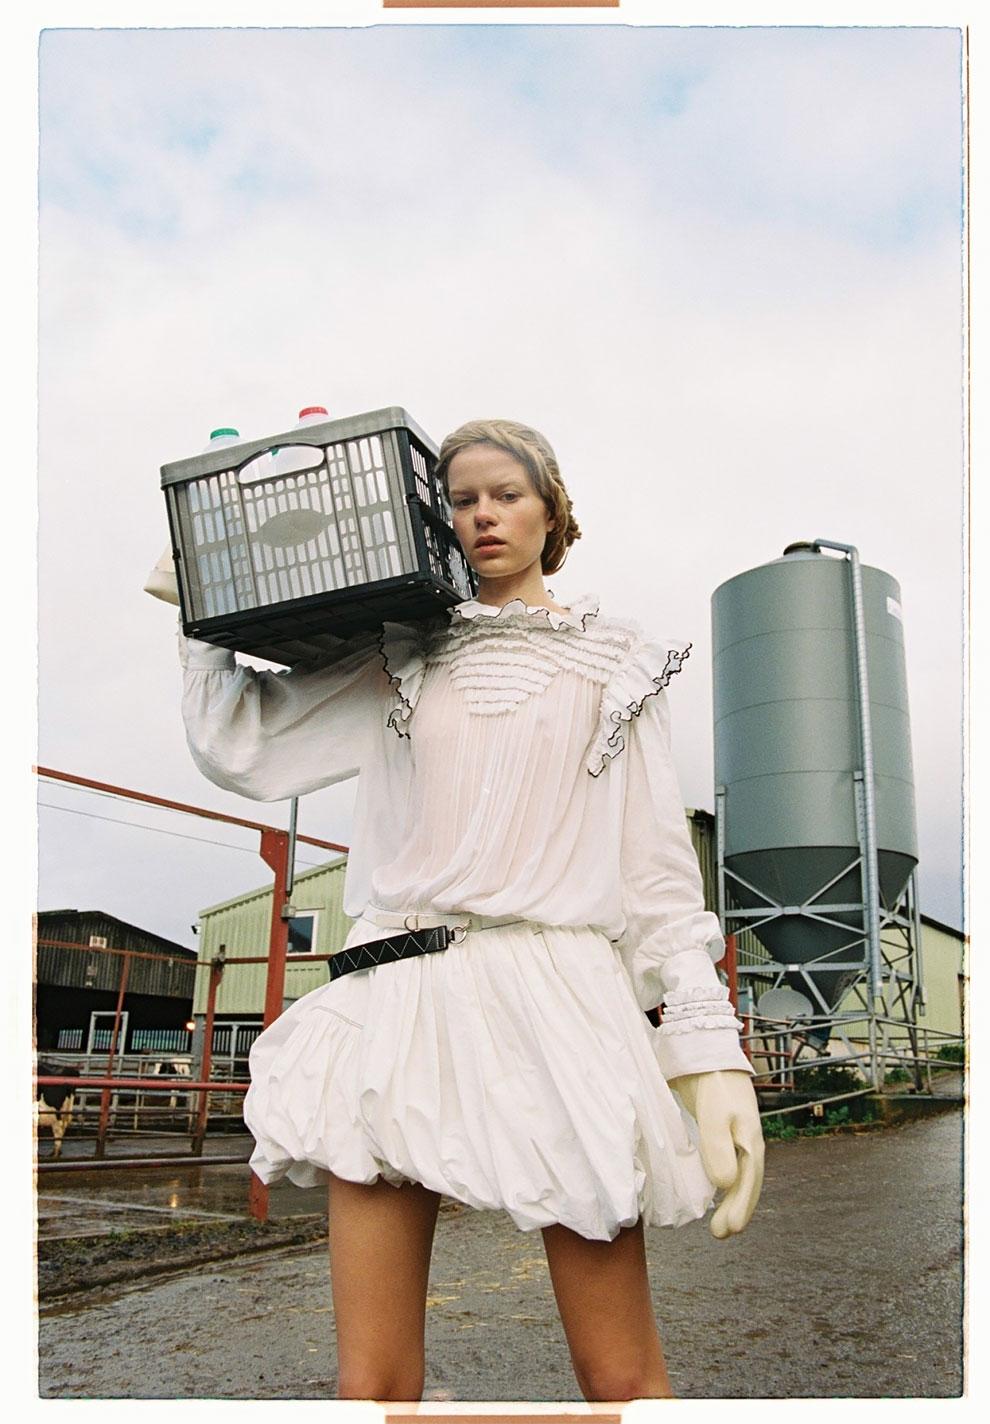 Чешский фотограф Михал Пуделка девочки, девочки, девочки (13).jpg